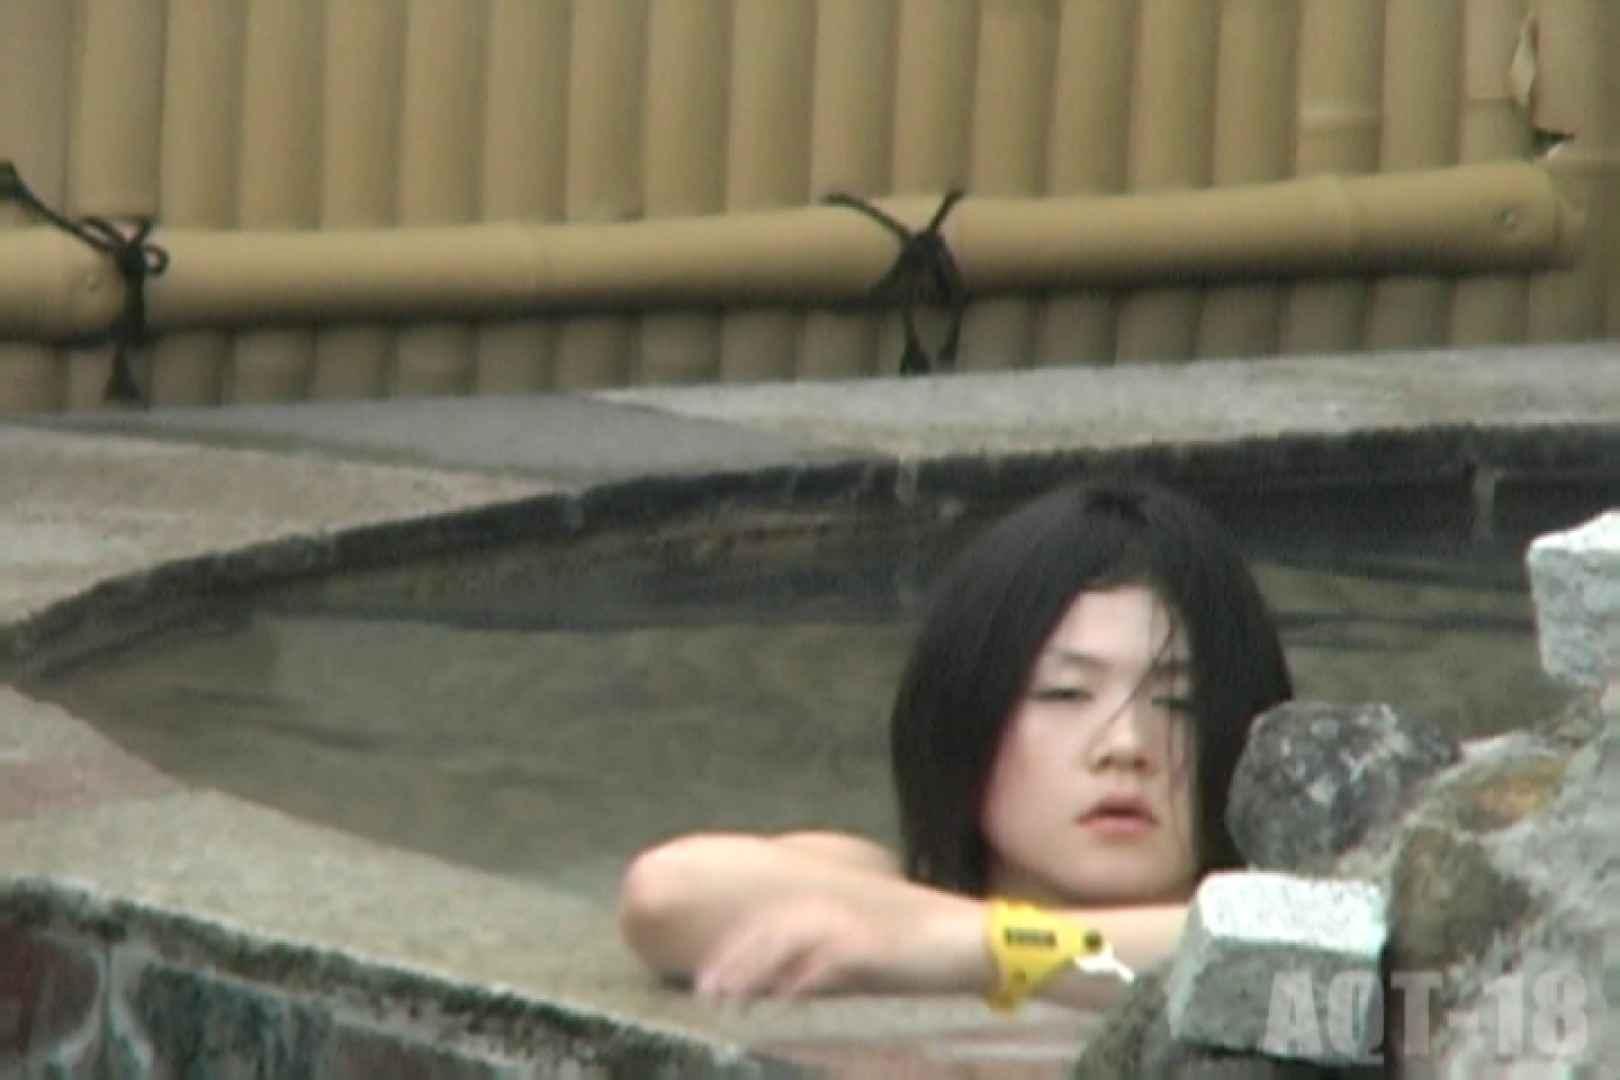 Aquaな露天風呂Vol.859 盗撮 戯れ無修正画像 76連発 20